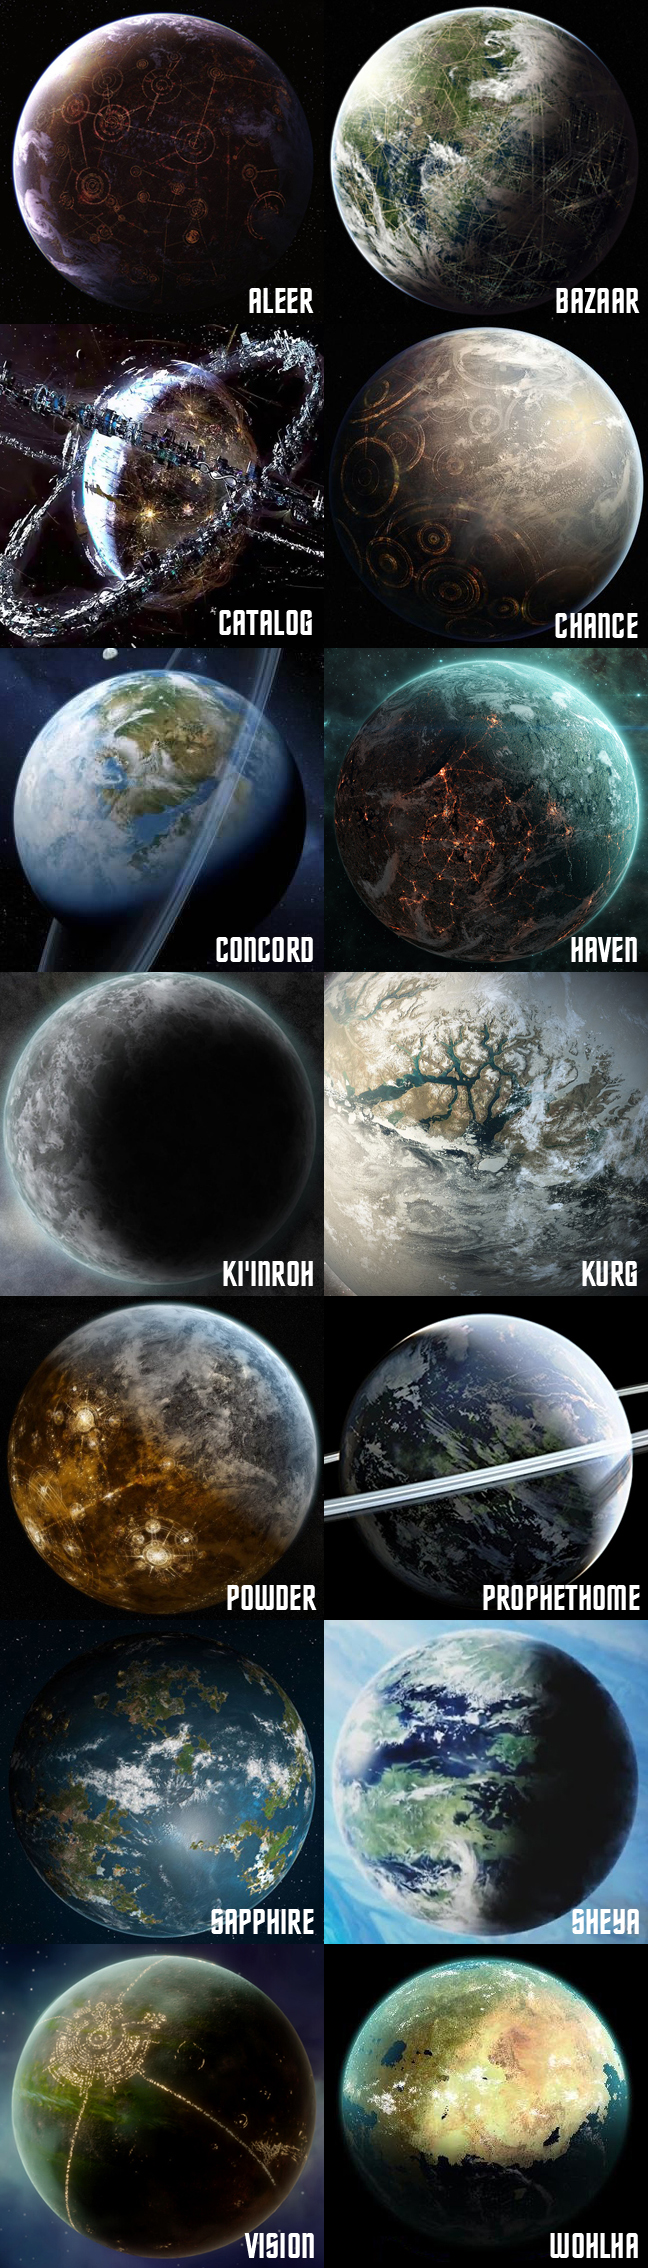 sidebar_planets3.jpg